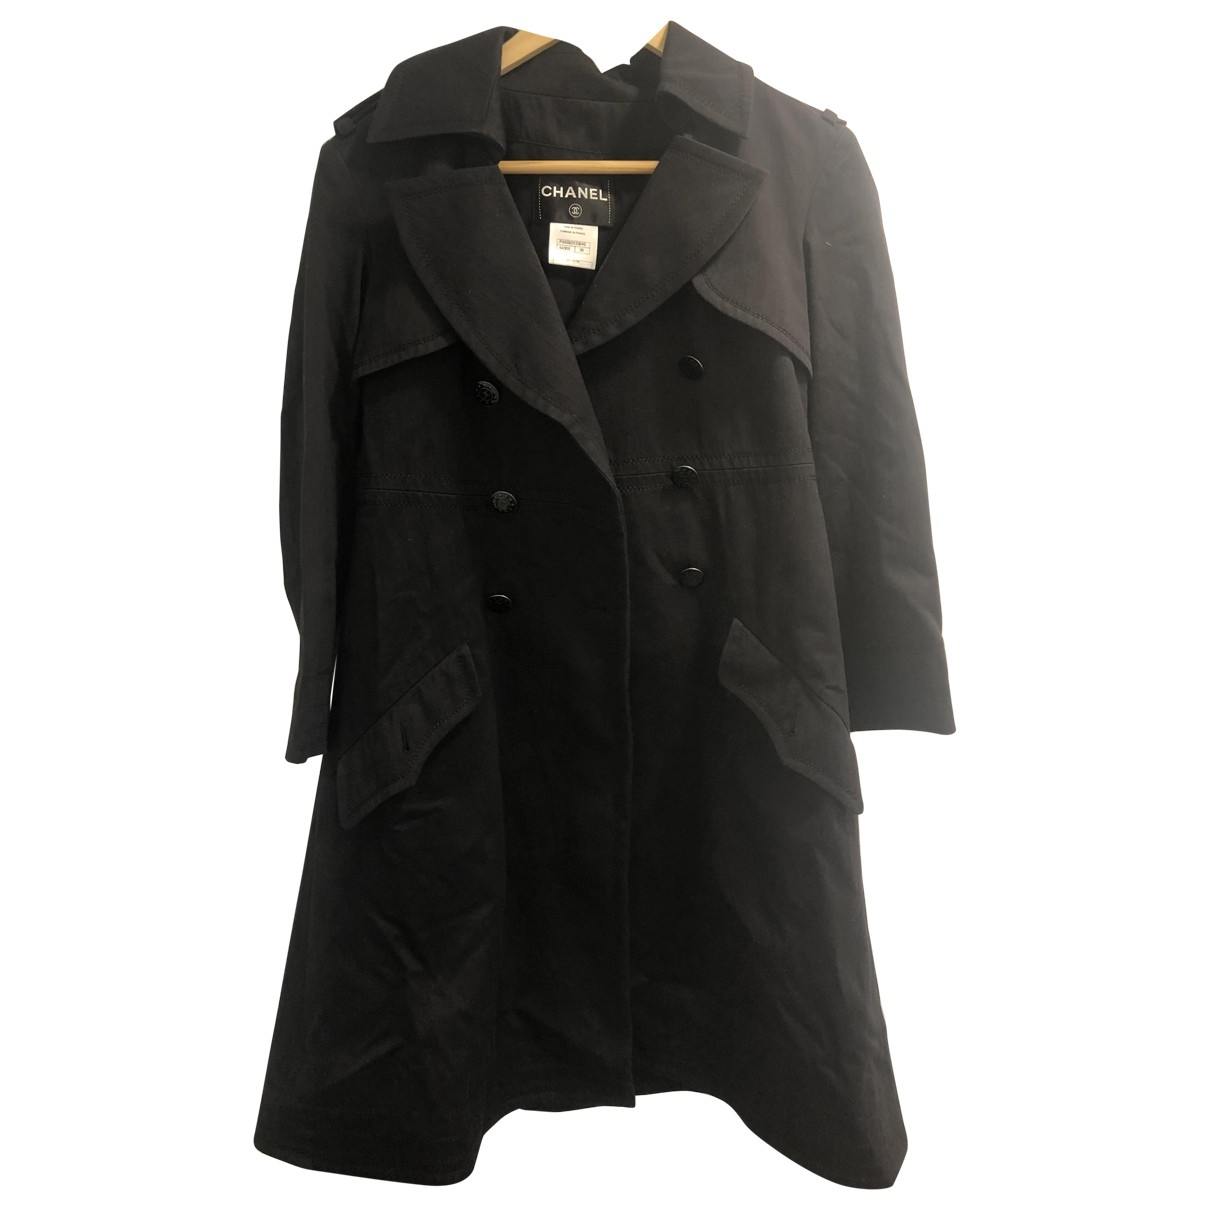 Chanel \N Black Cotton coat for Women 36 FR